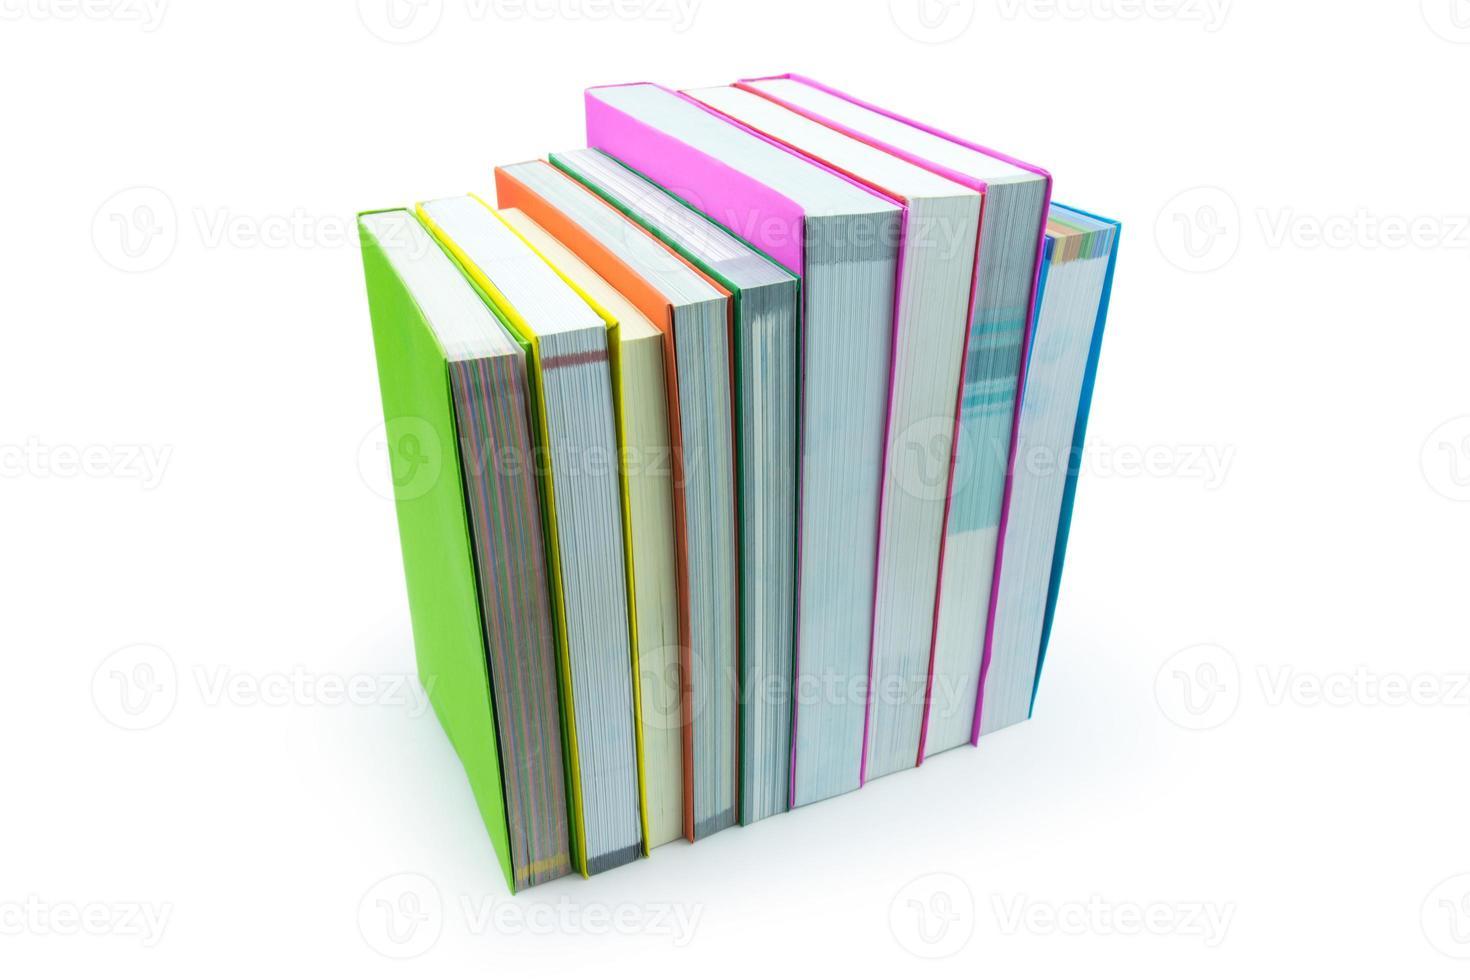 bok isolerad på vit bakgrund foto